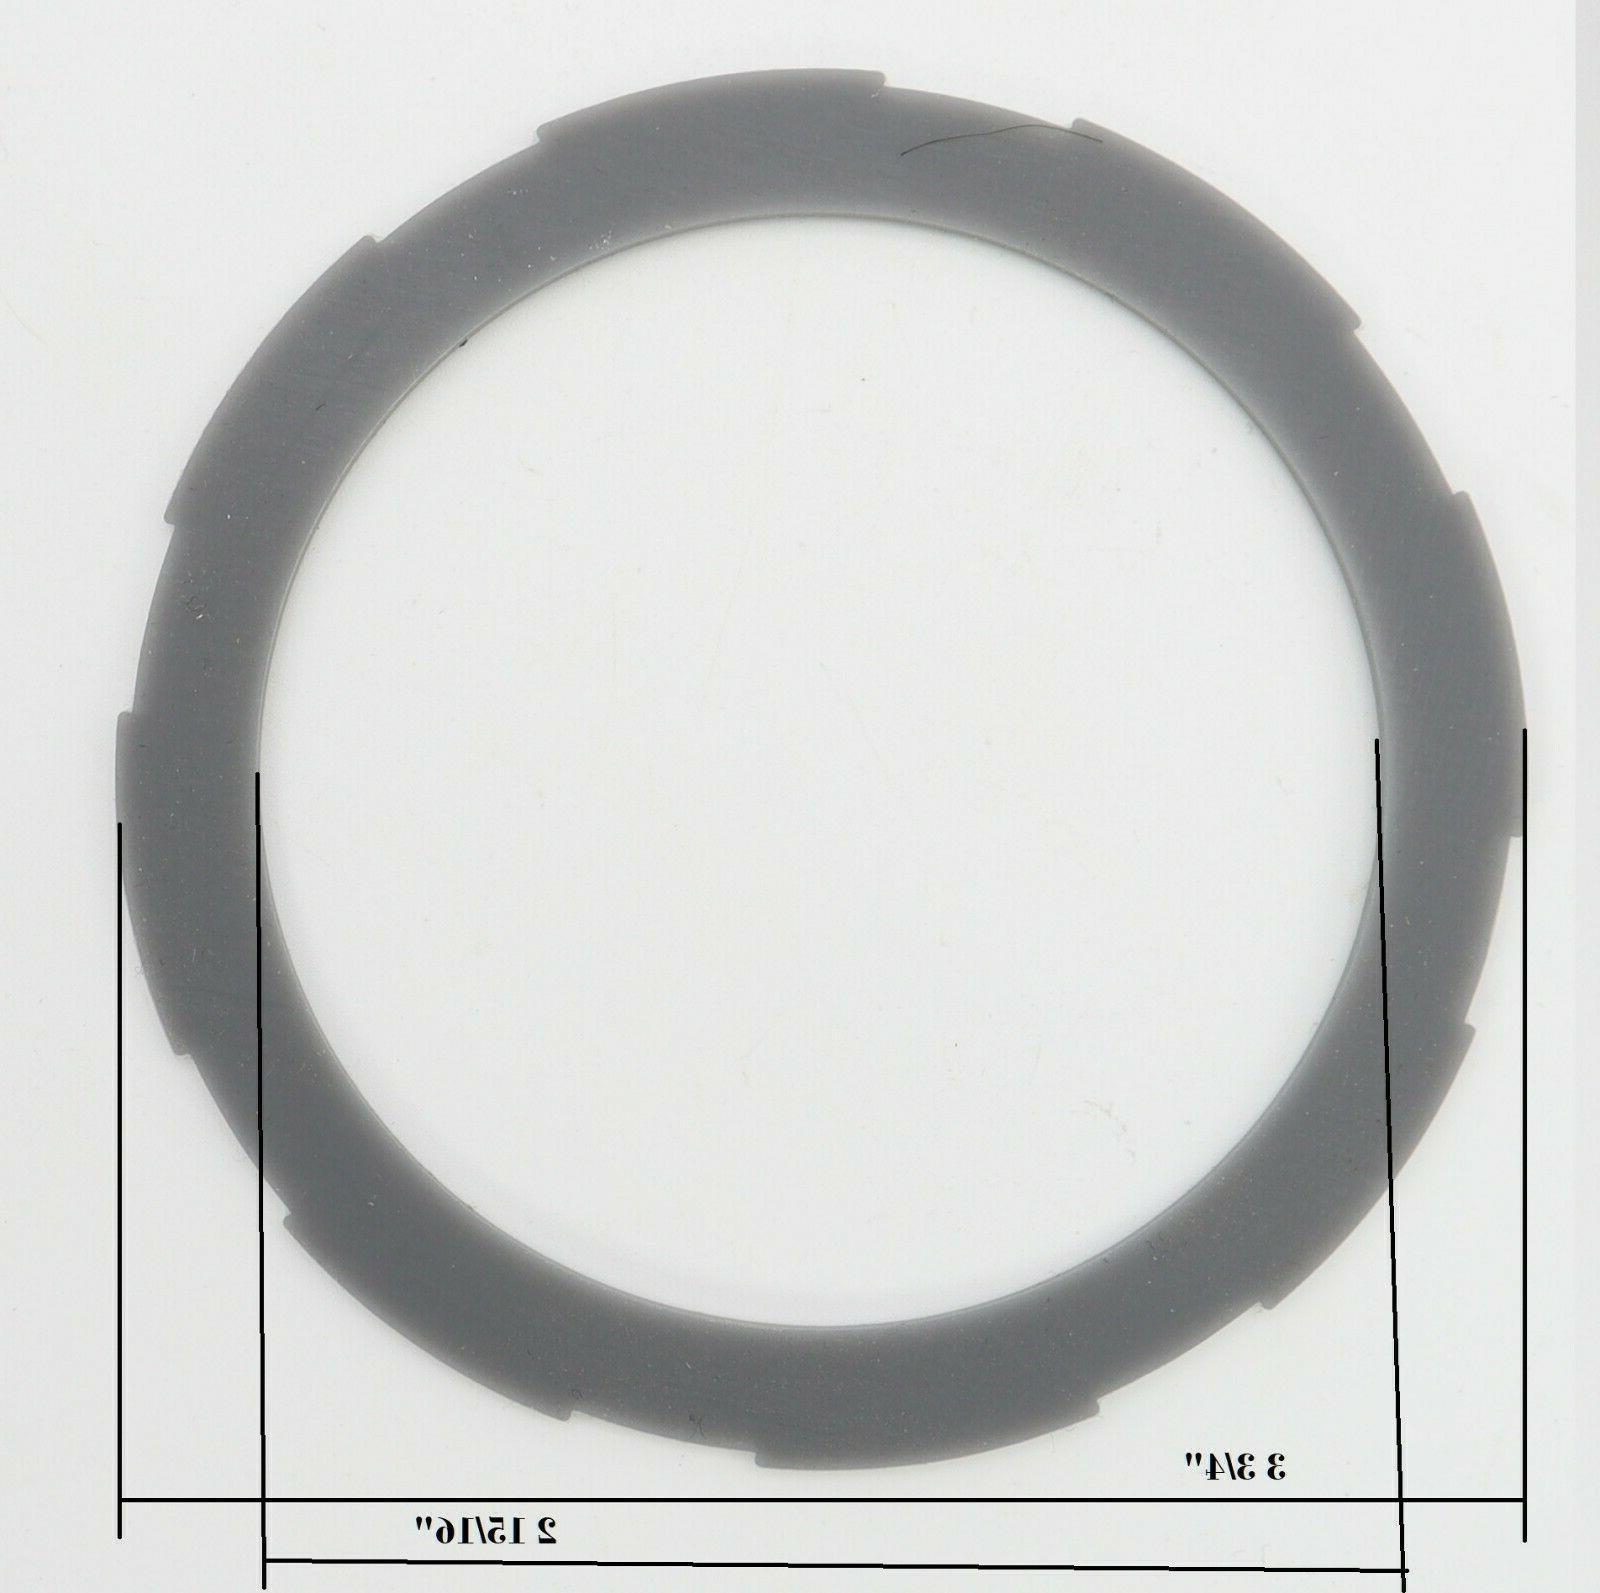 Blenpar Gasket Sealing Ring Pro 1200 Blender